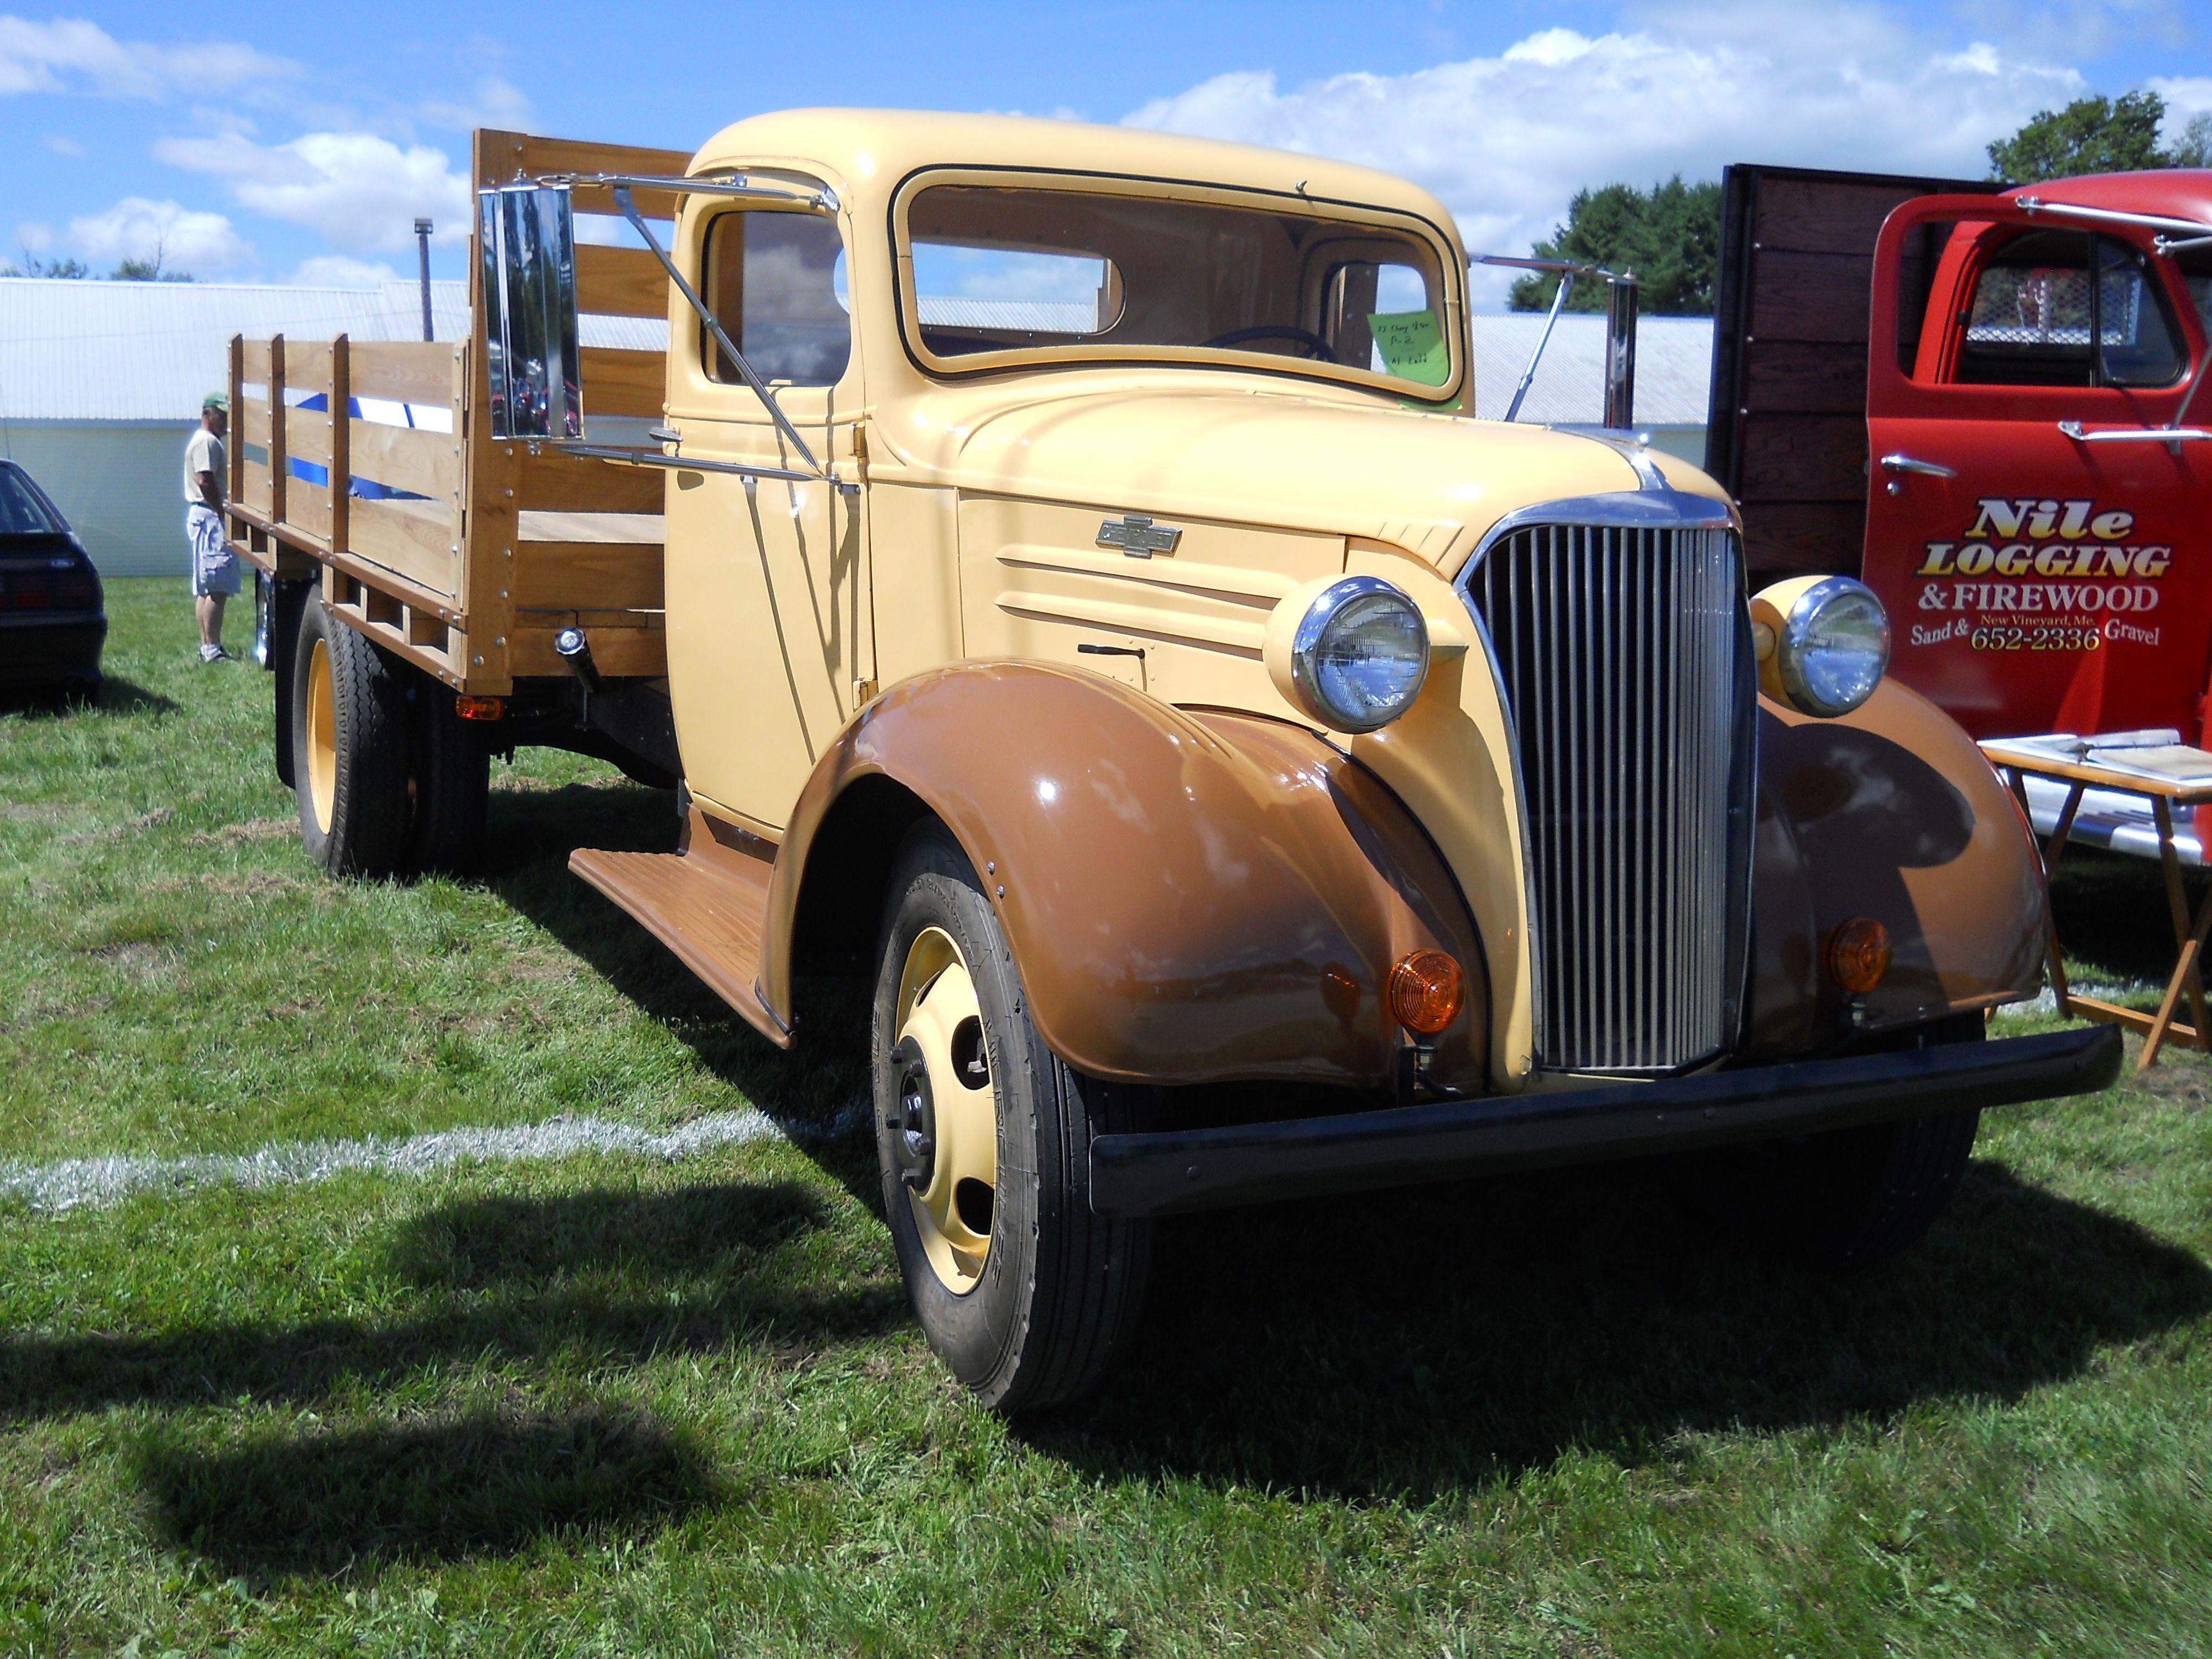 1 1/2 Ton 1937 Chevrolet Hauling Truck https//www.youtube